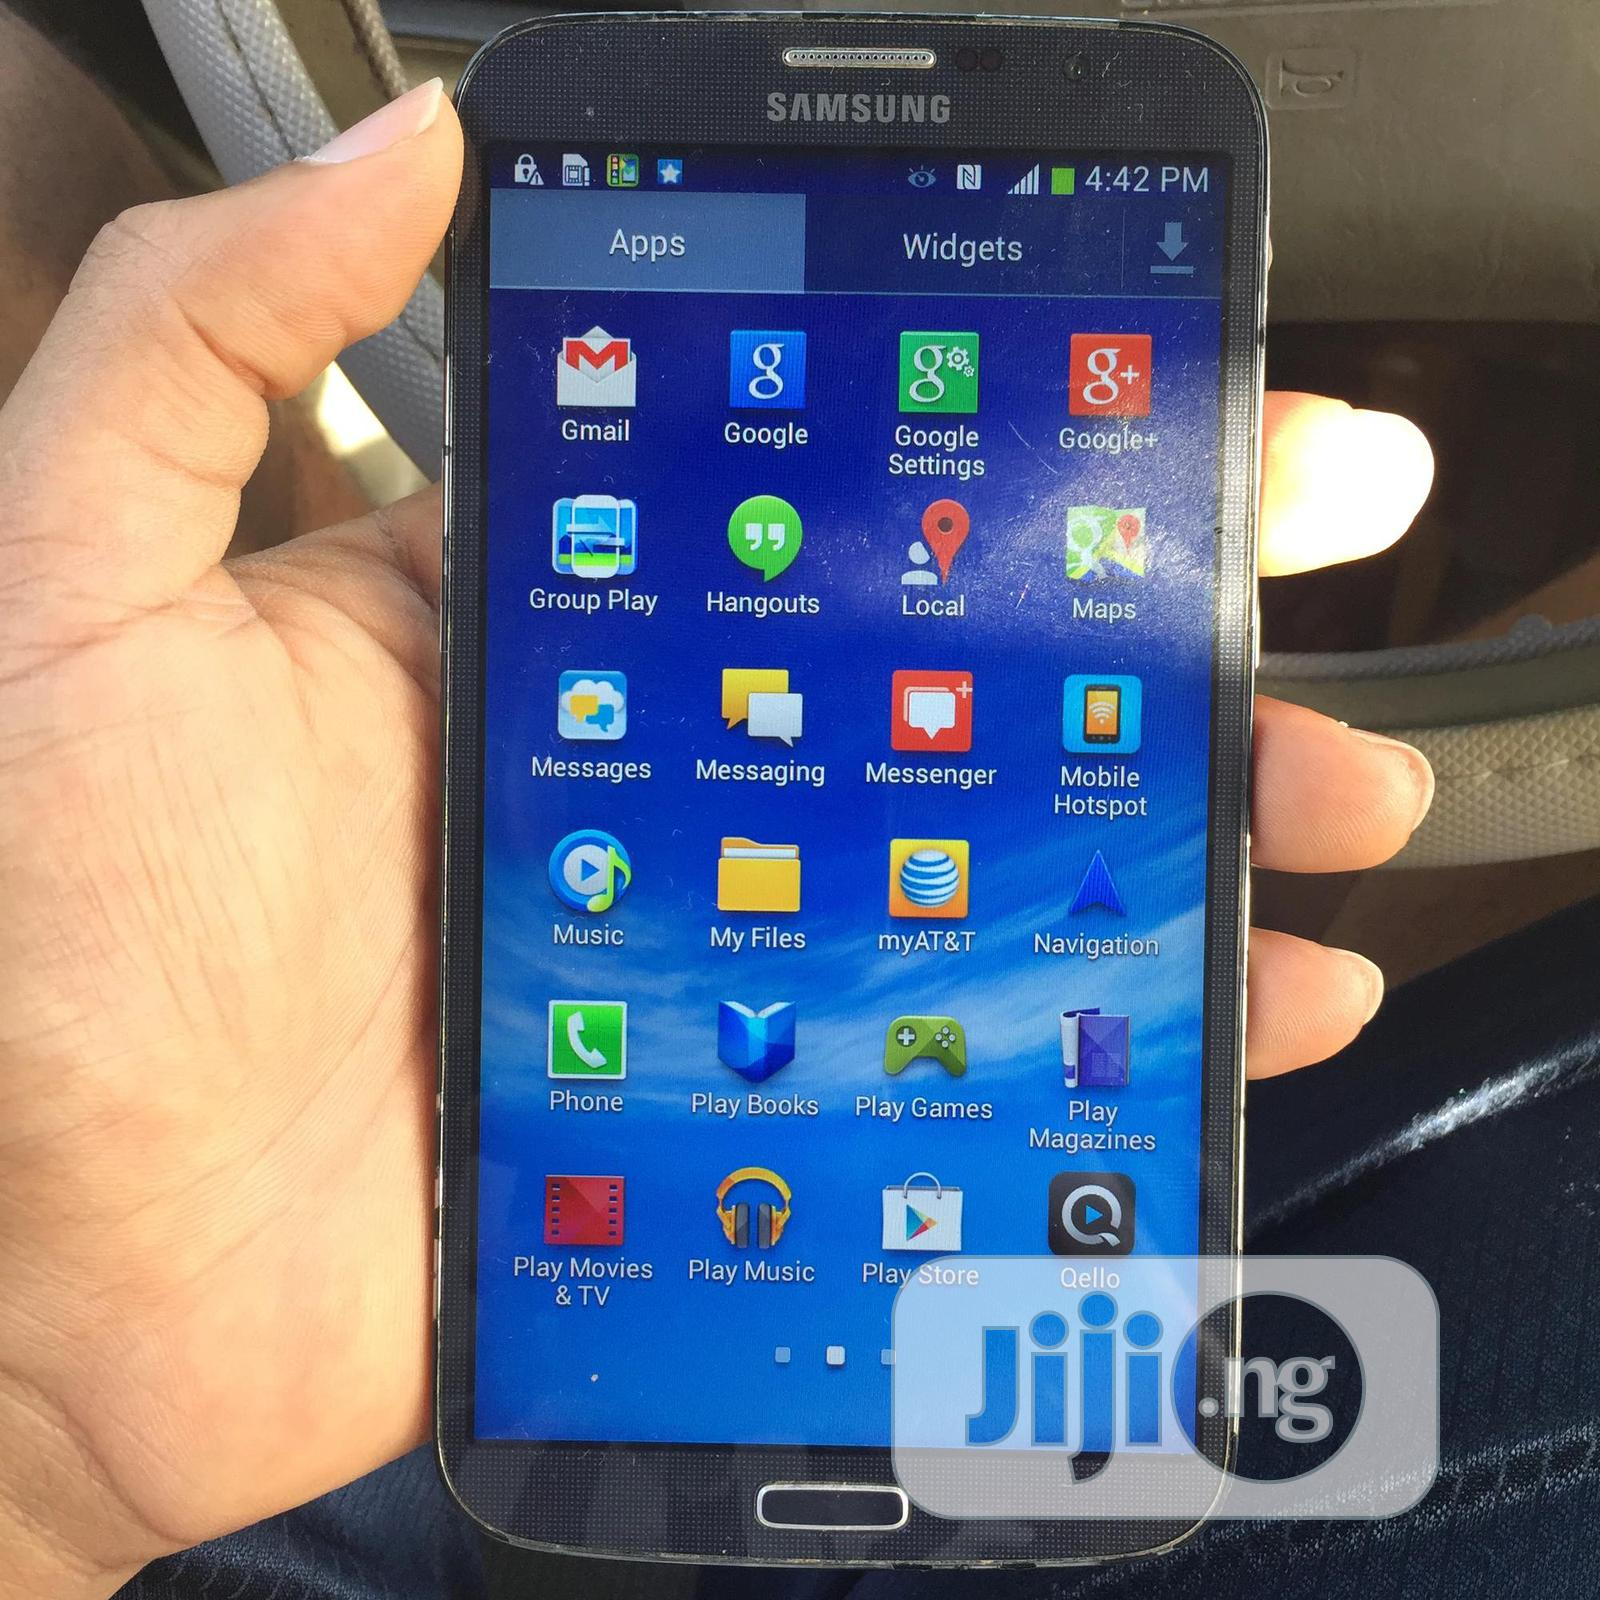 Samsung Galaxy Mega 2 16 GB Black | Mobile Phones for sale in Kubwa, Abuja (FCT) State, Nigeria